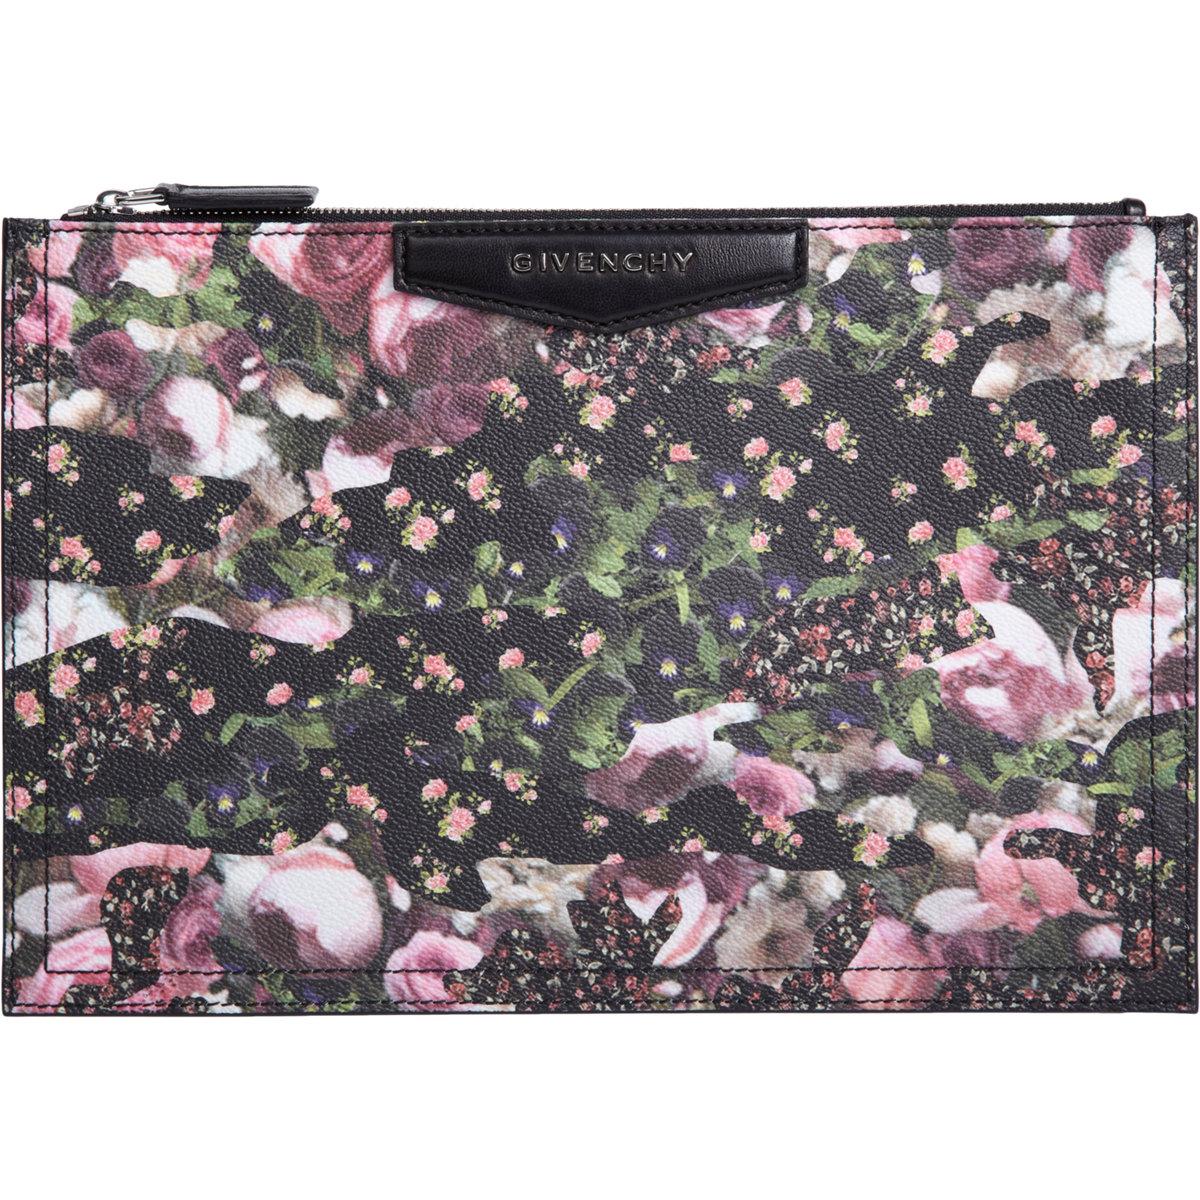 Givenchy Medium Antigona Floral Camo Zip Pouch at Barneys.com